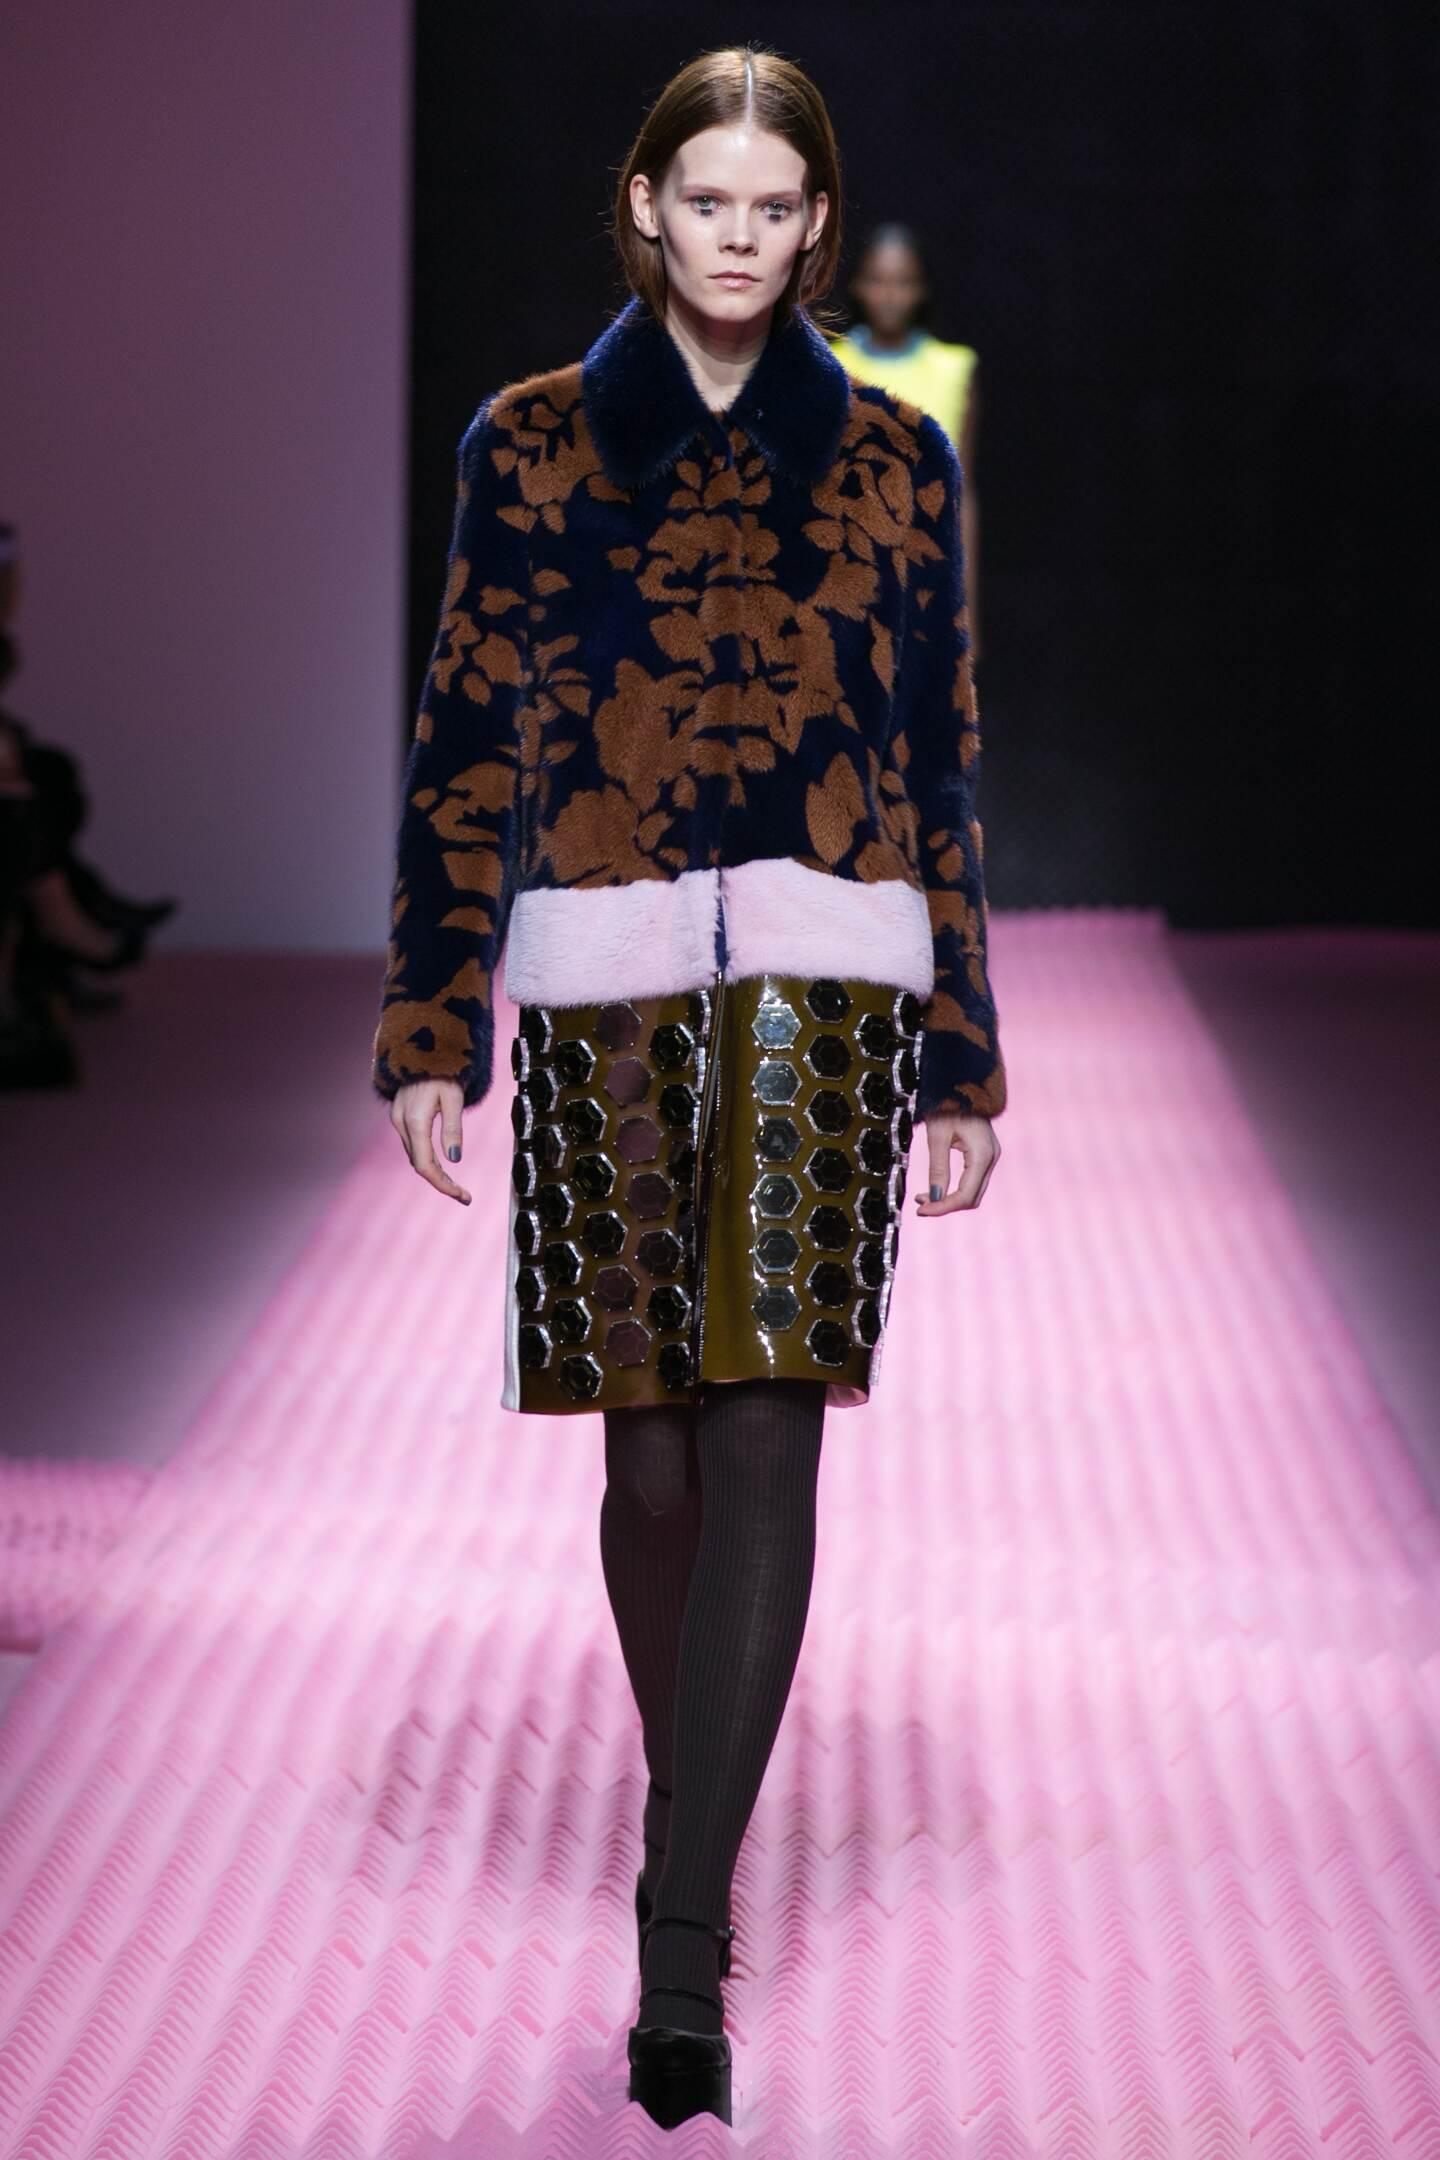 Catwalk Mary Katrantzou Womenswear Collection Winter 2015